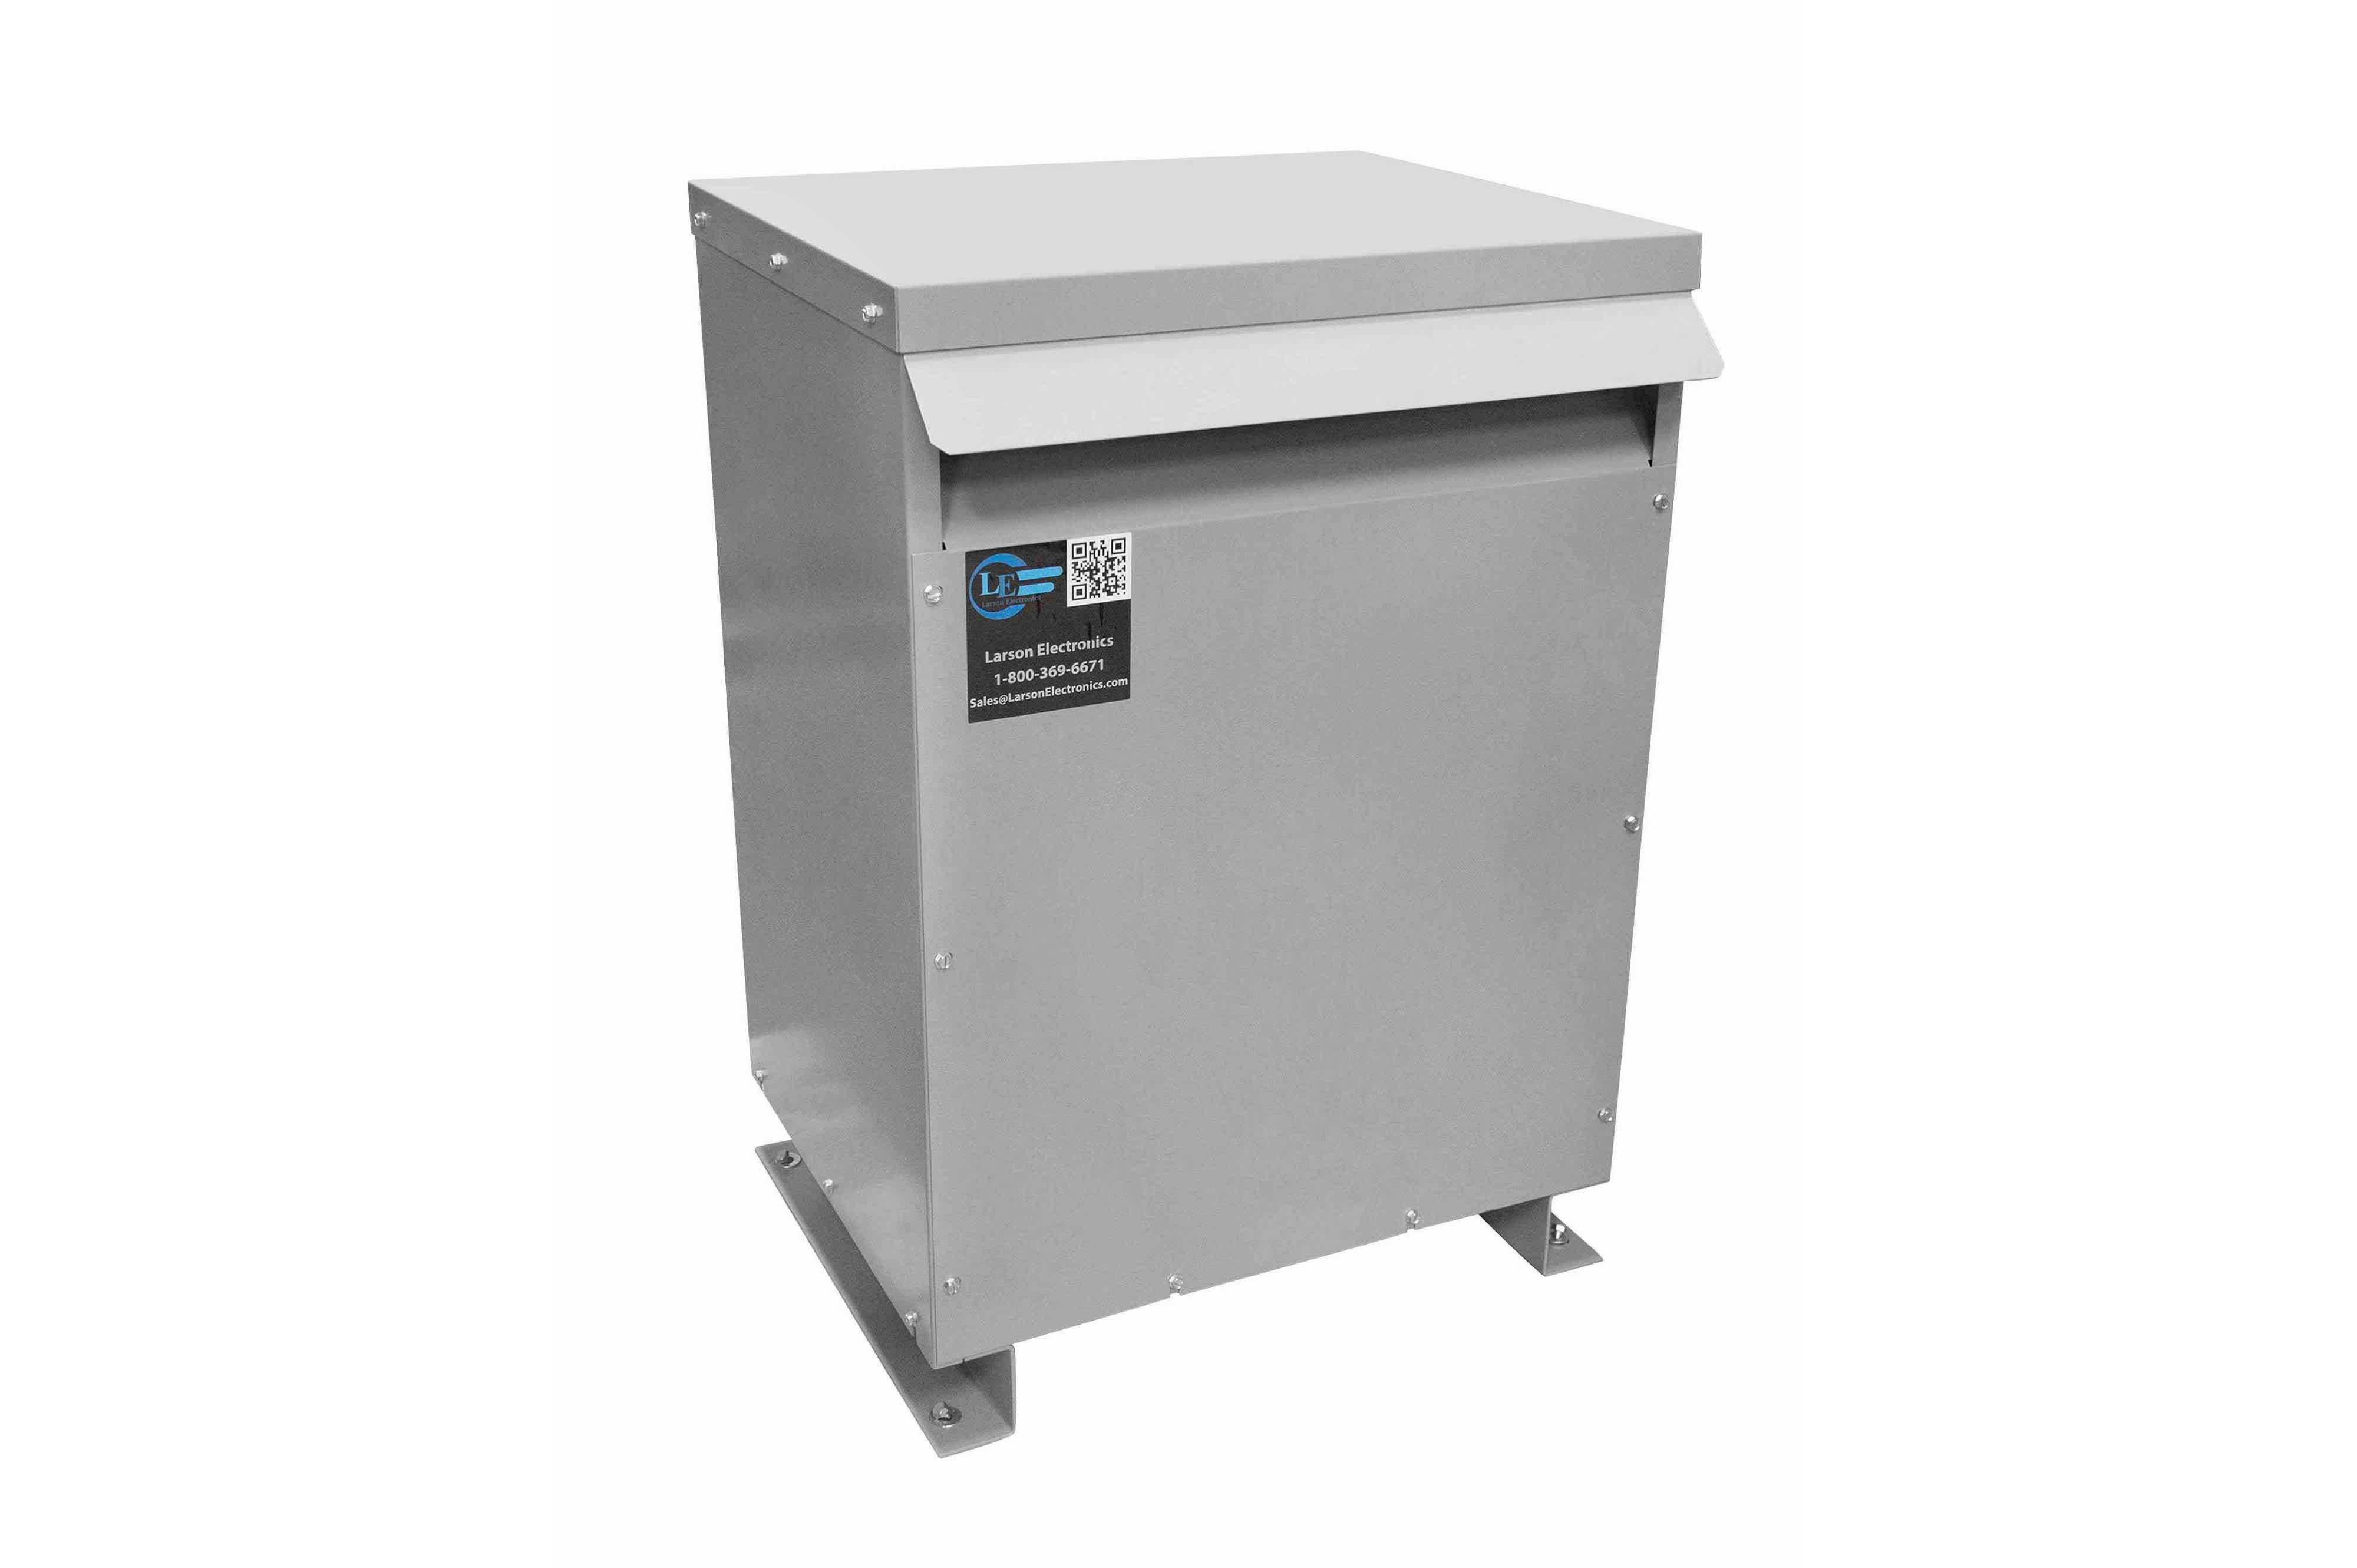 42.5 kVA 3PH Isolation Transformer, 400V Wye Primary, 480V Delta Secondary, N3R, Ventilated, 60 Hz